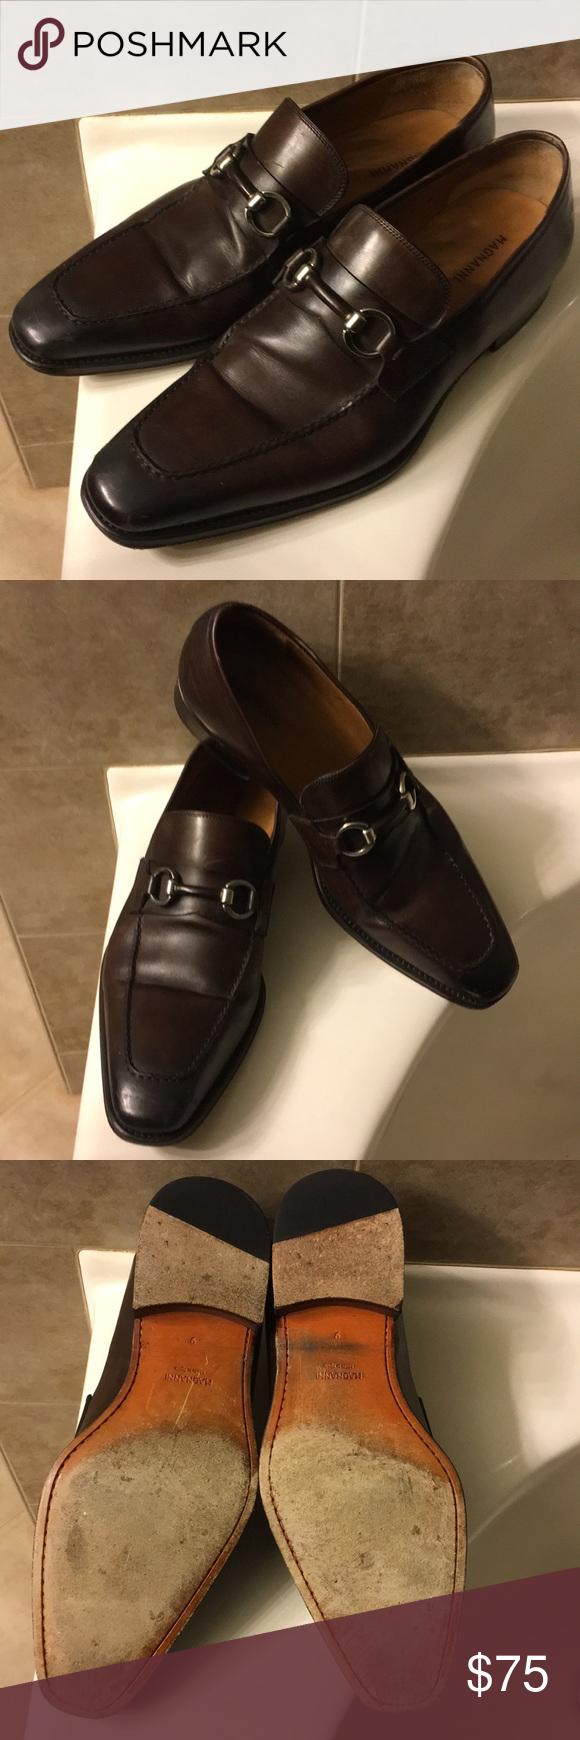 Magnanni dark brown dress loafers shoes euc dress loafers dark